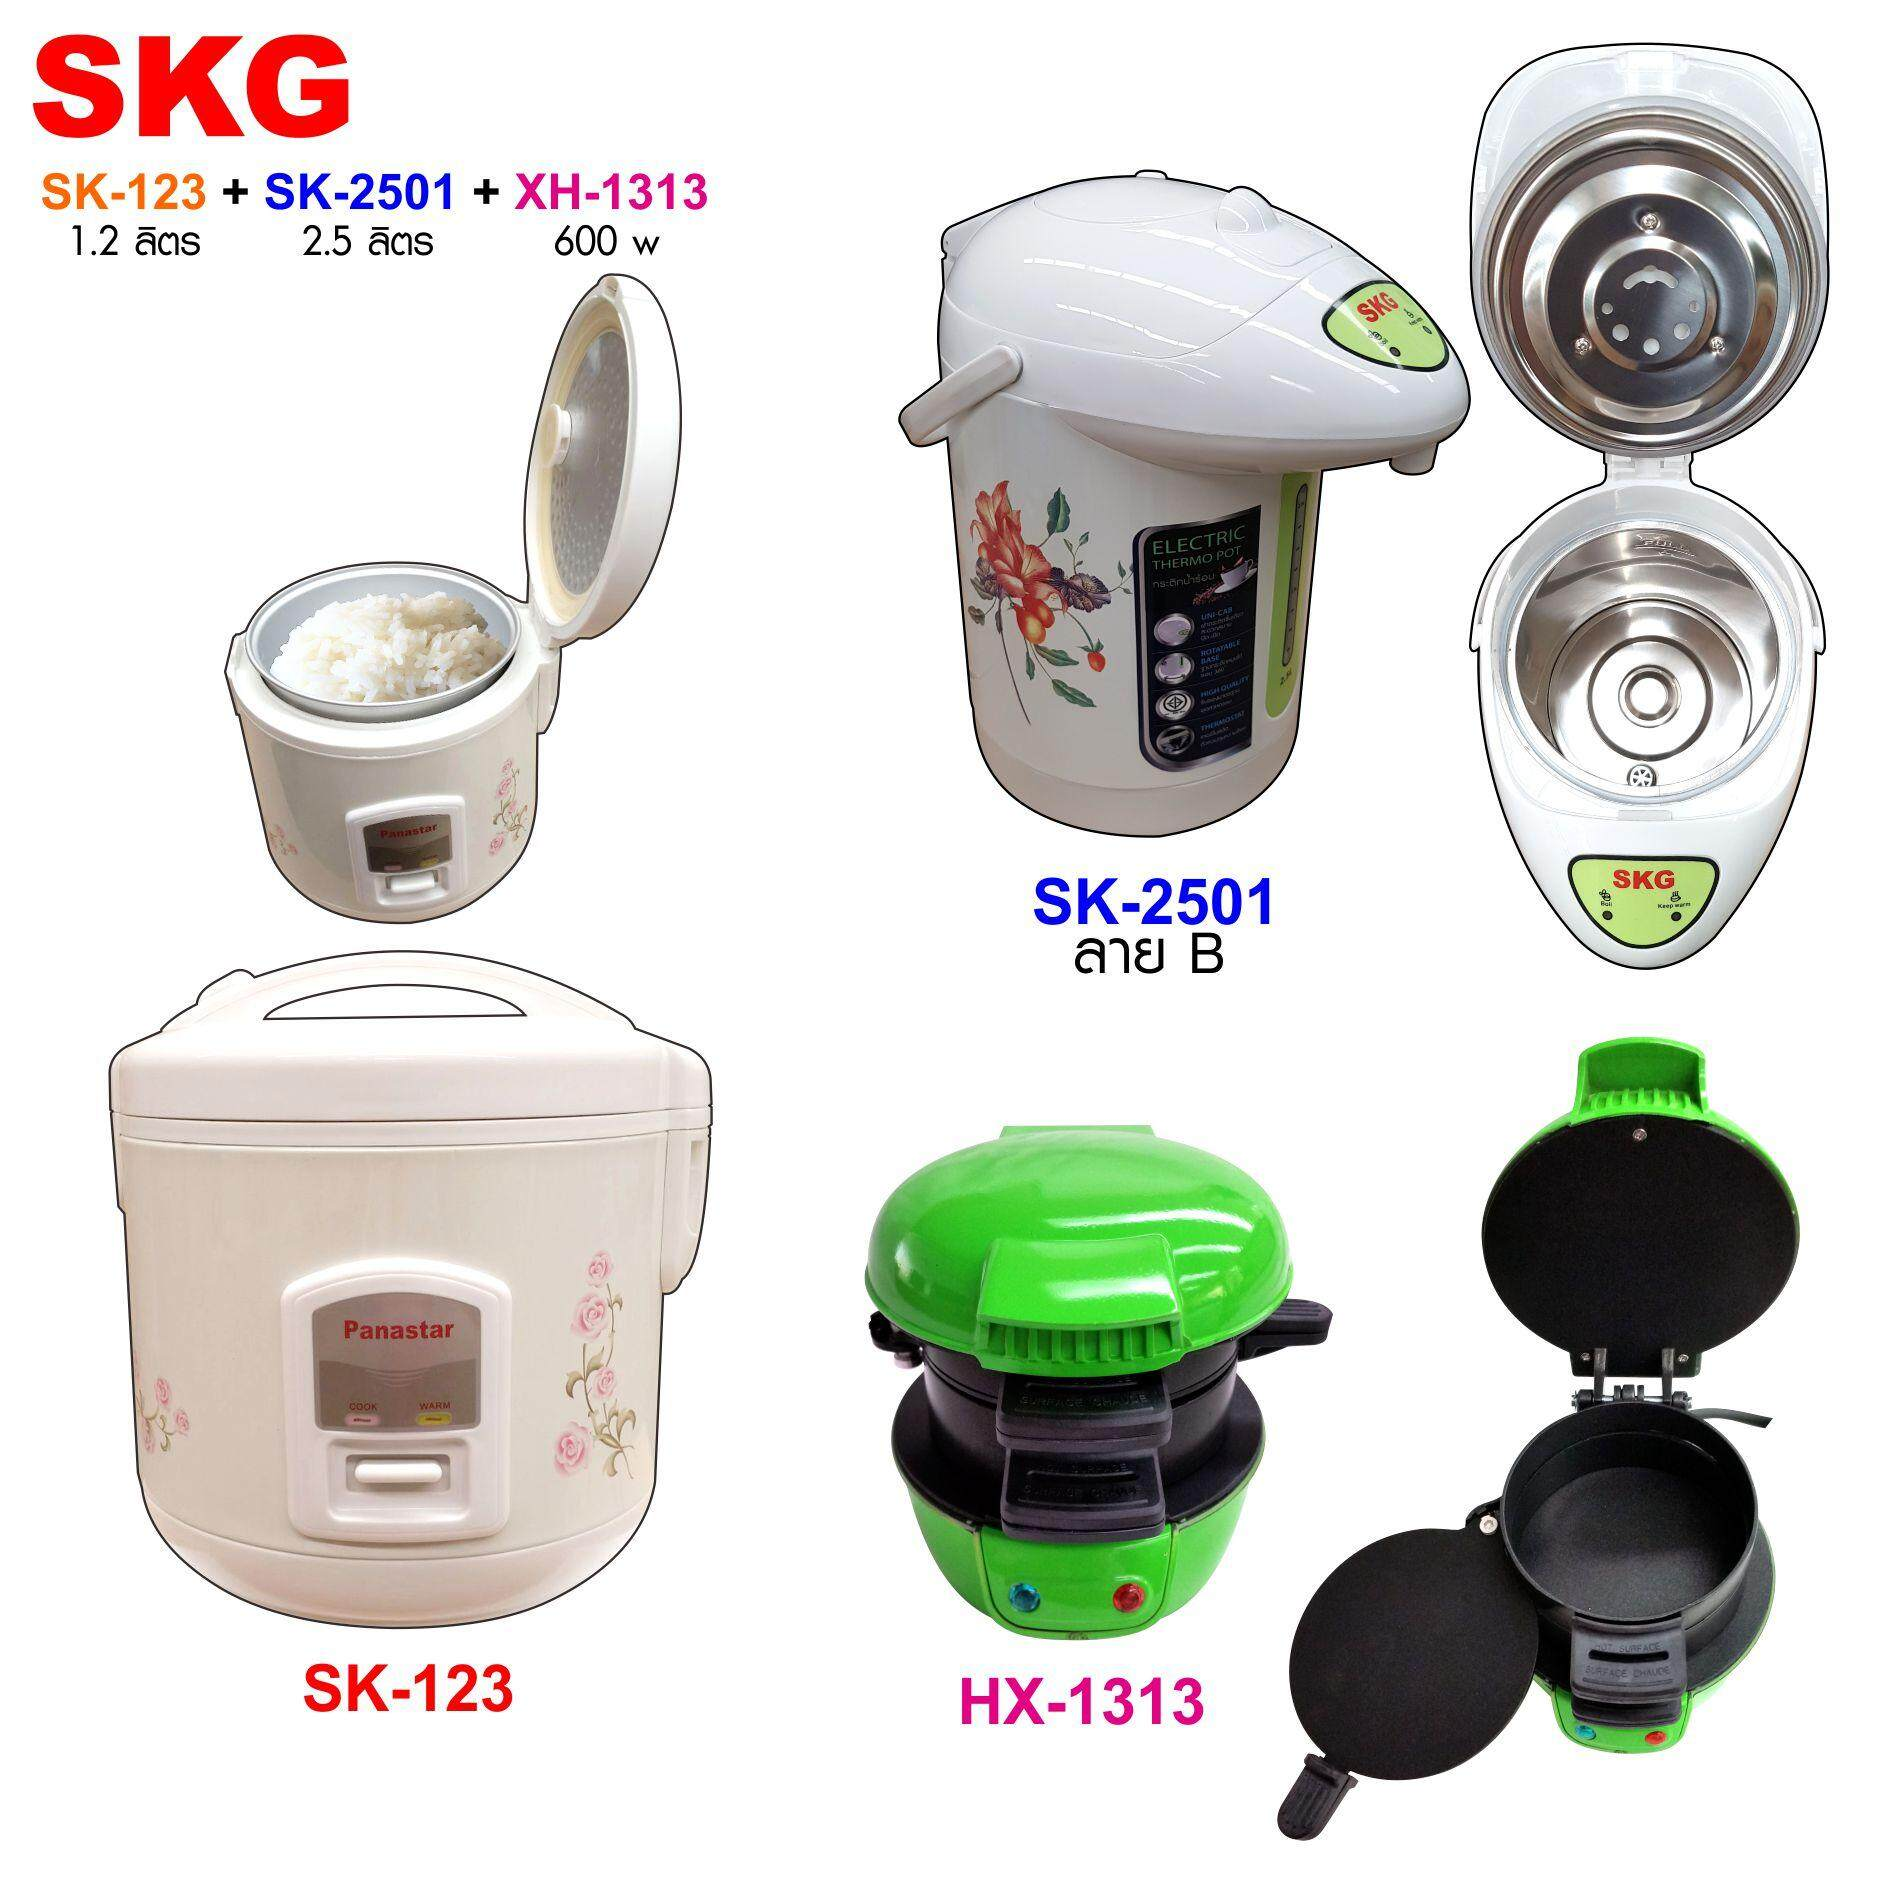 SKG ชุดเซ็ทประหยัดสุดคุ้ม 3 รุ่น SK-123 +XH-1313 เขียว+SK-2501ลายB